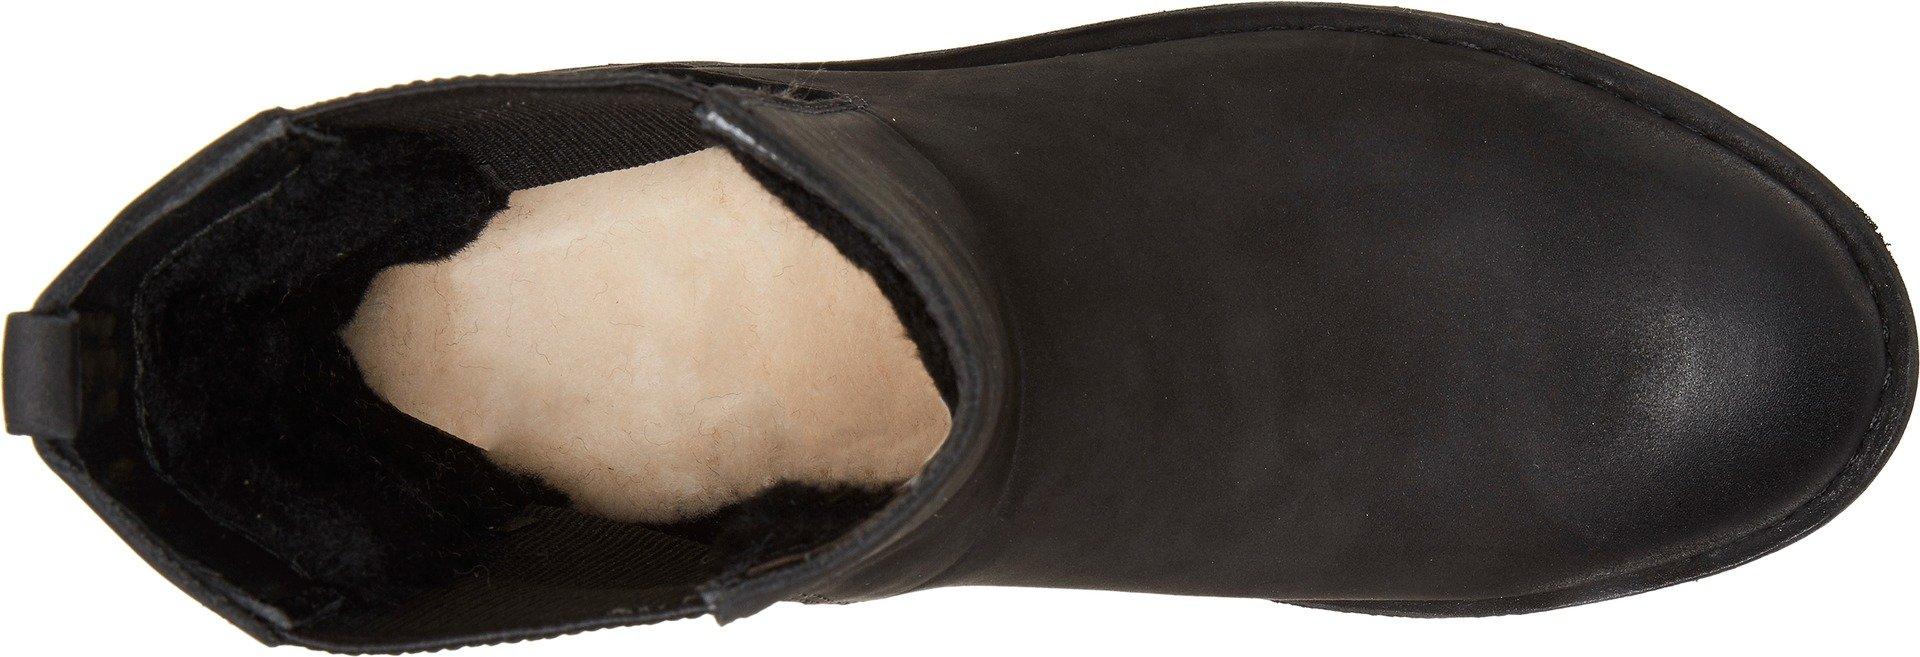 UGG Women's Larra Snow Boot, Black, 10 M US by UGG (Image #2)